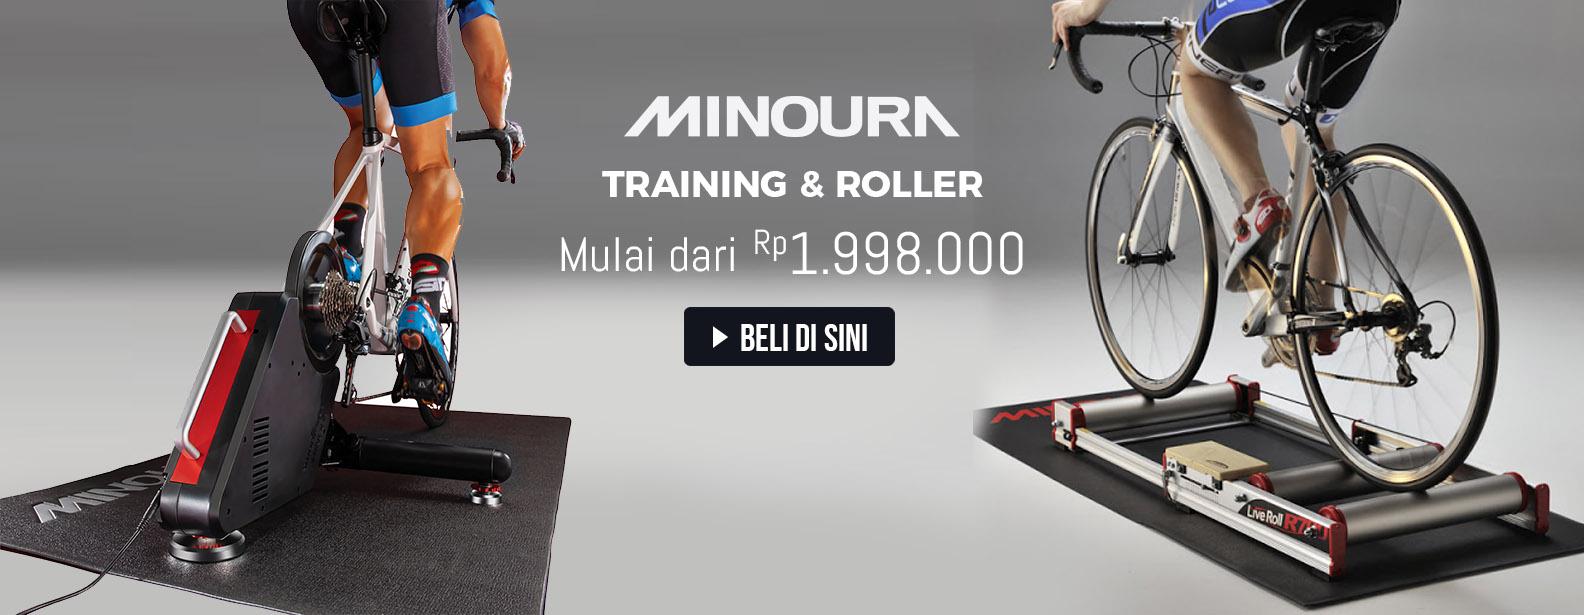 Minoura Koleksi Training